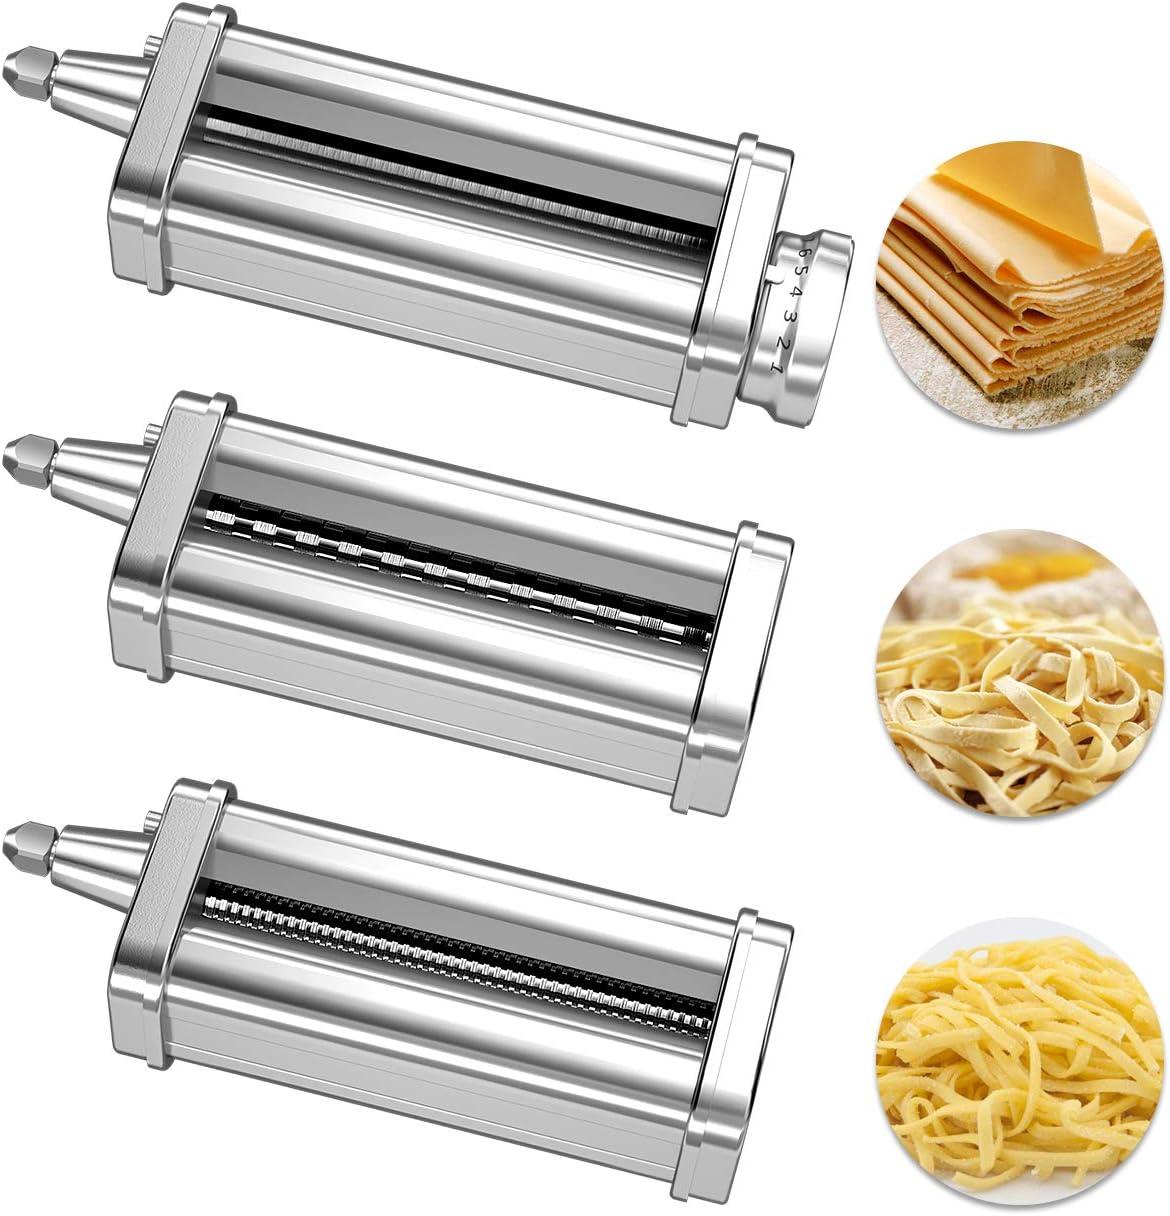 Pasta Maker Attachment for KitchenAid Stand Mixer, Includes Past